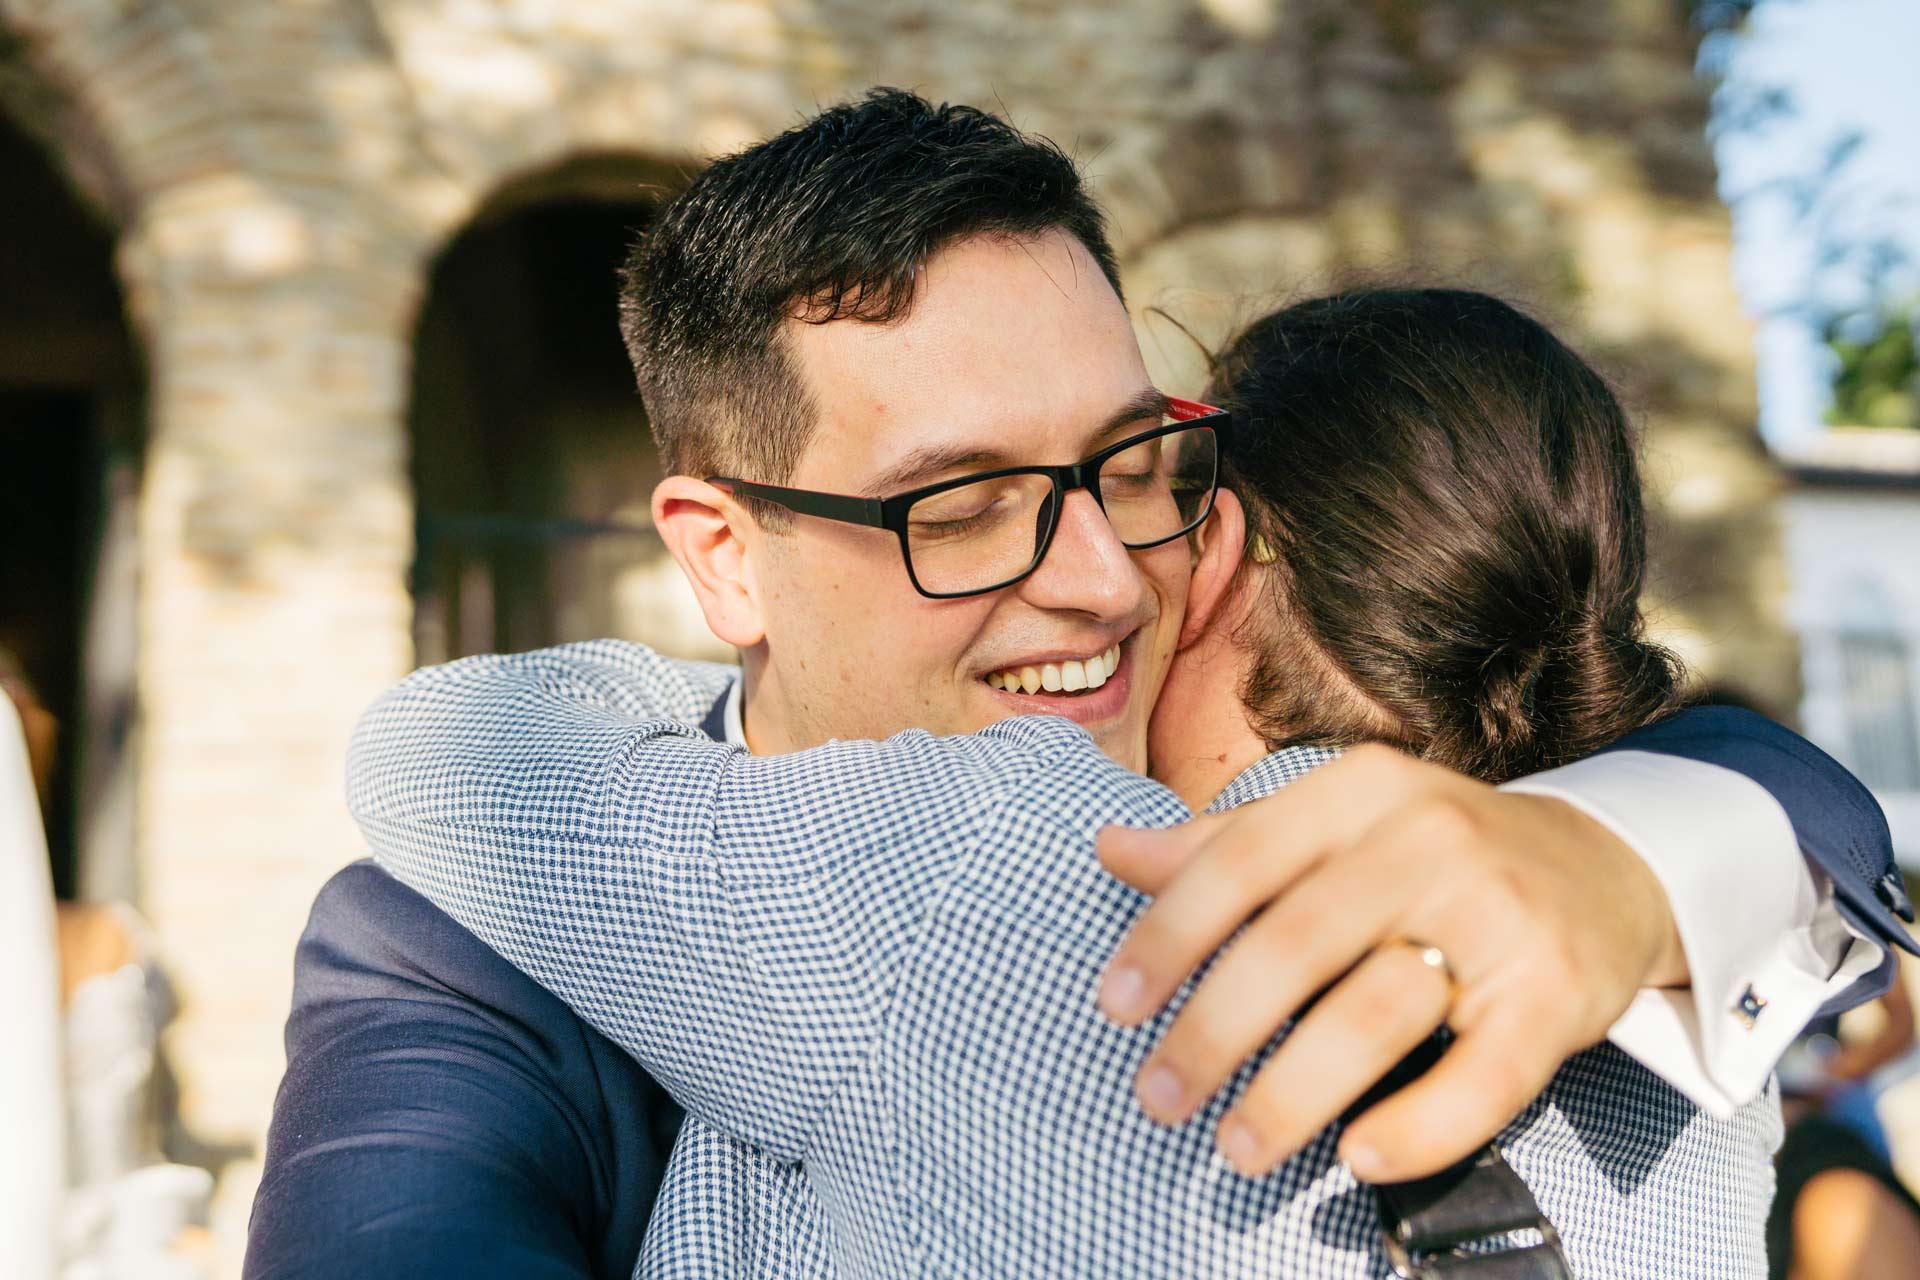 fotografo-matrimoni-reportage-s&g-3-sant'antimo